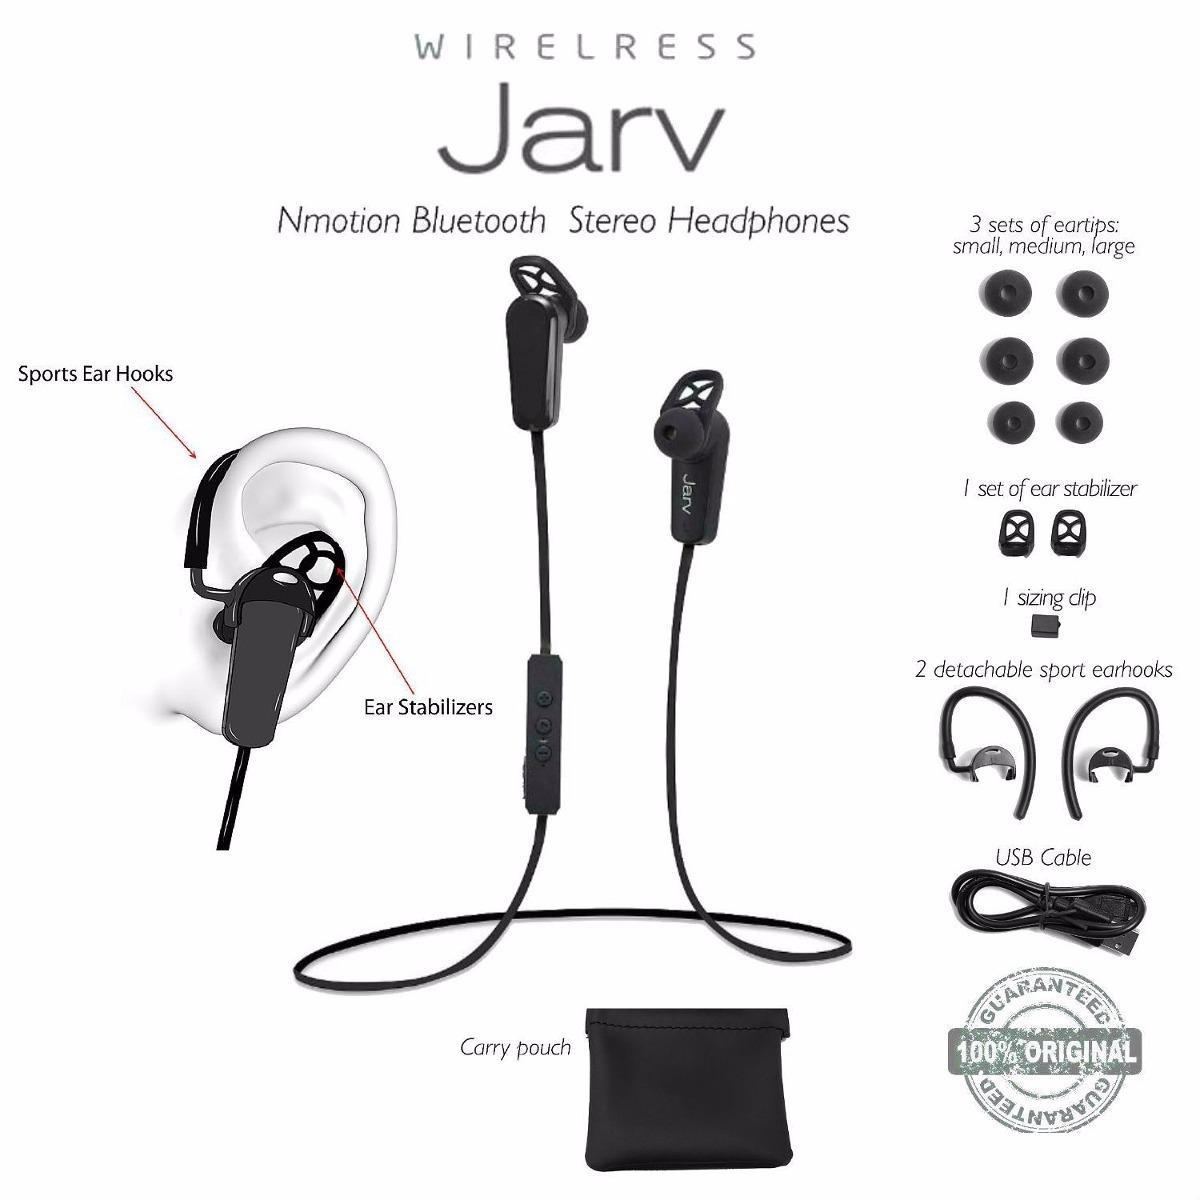 Jarv headphones